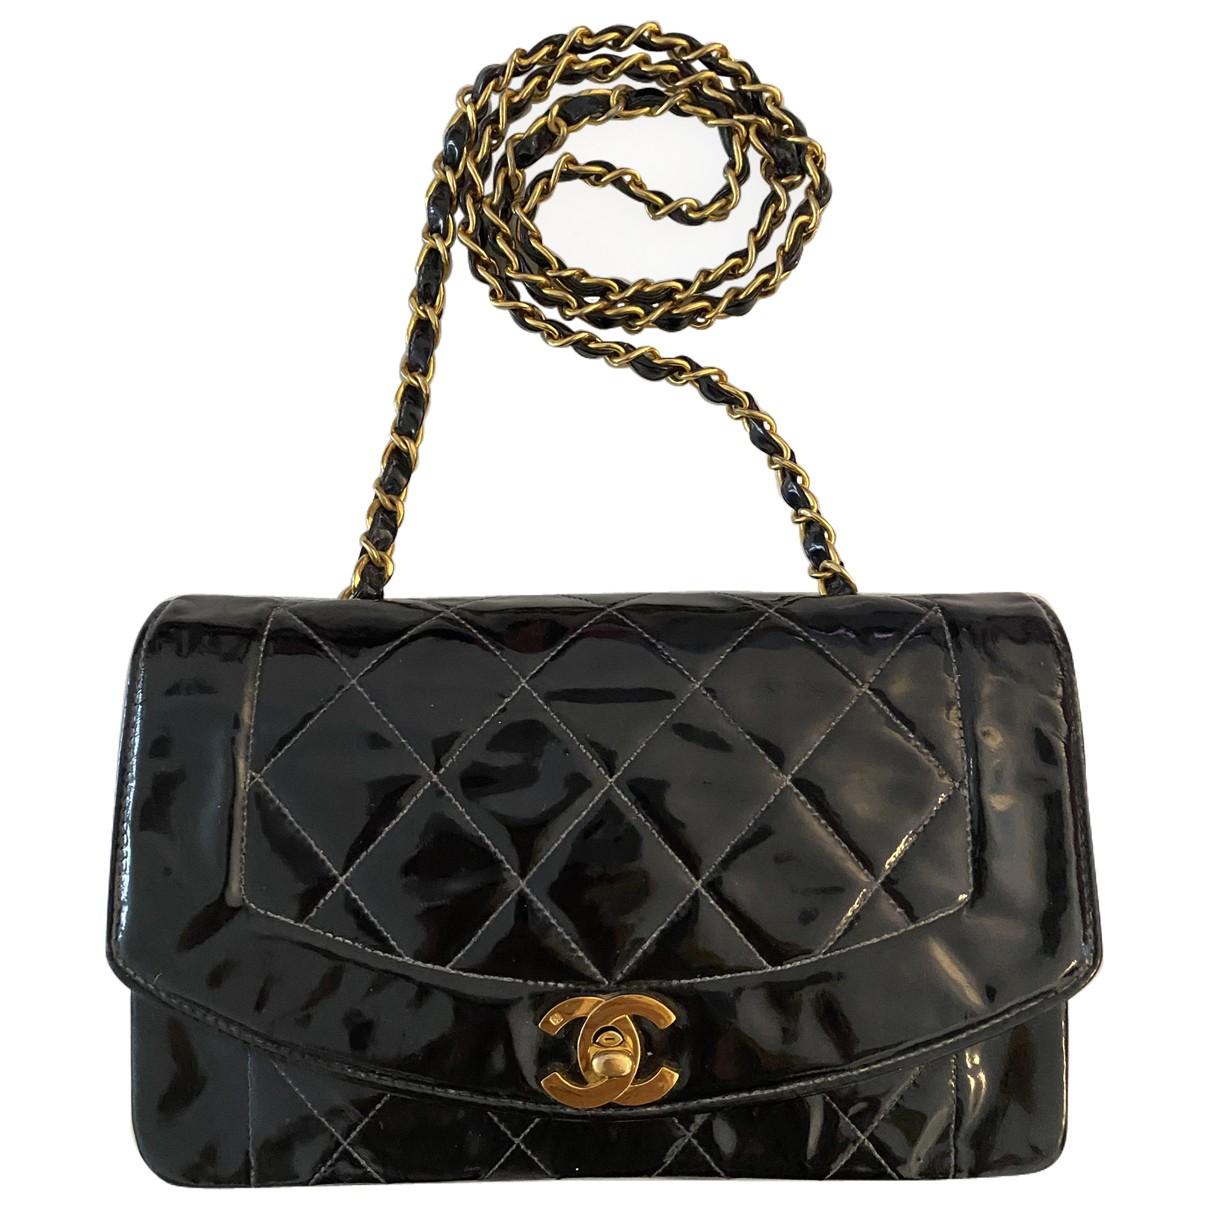 Chanel Diana Black Patent leather handbag for Women N